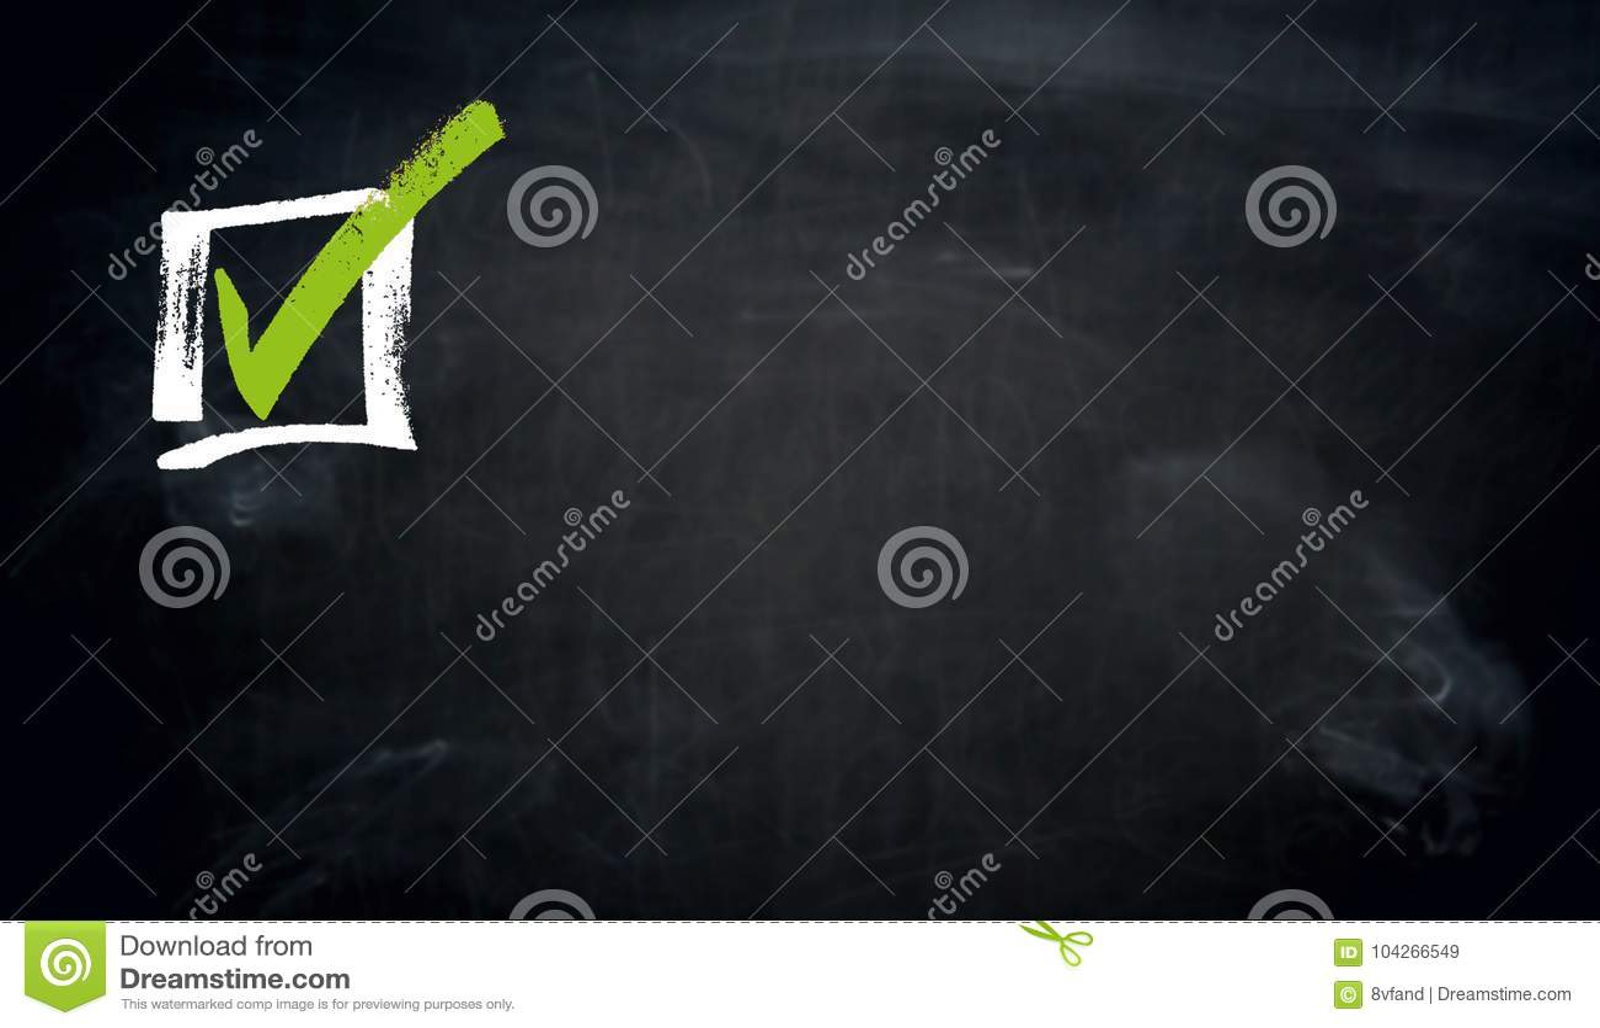 Checkbox chalkboard concept background